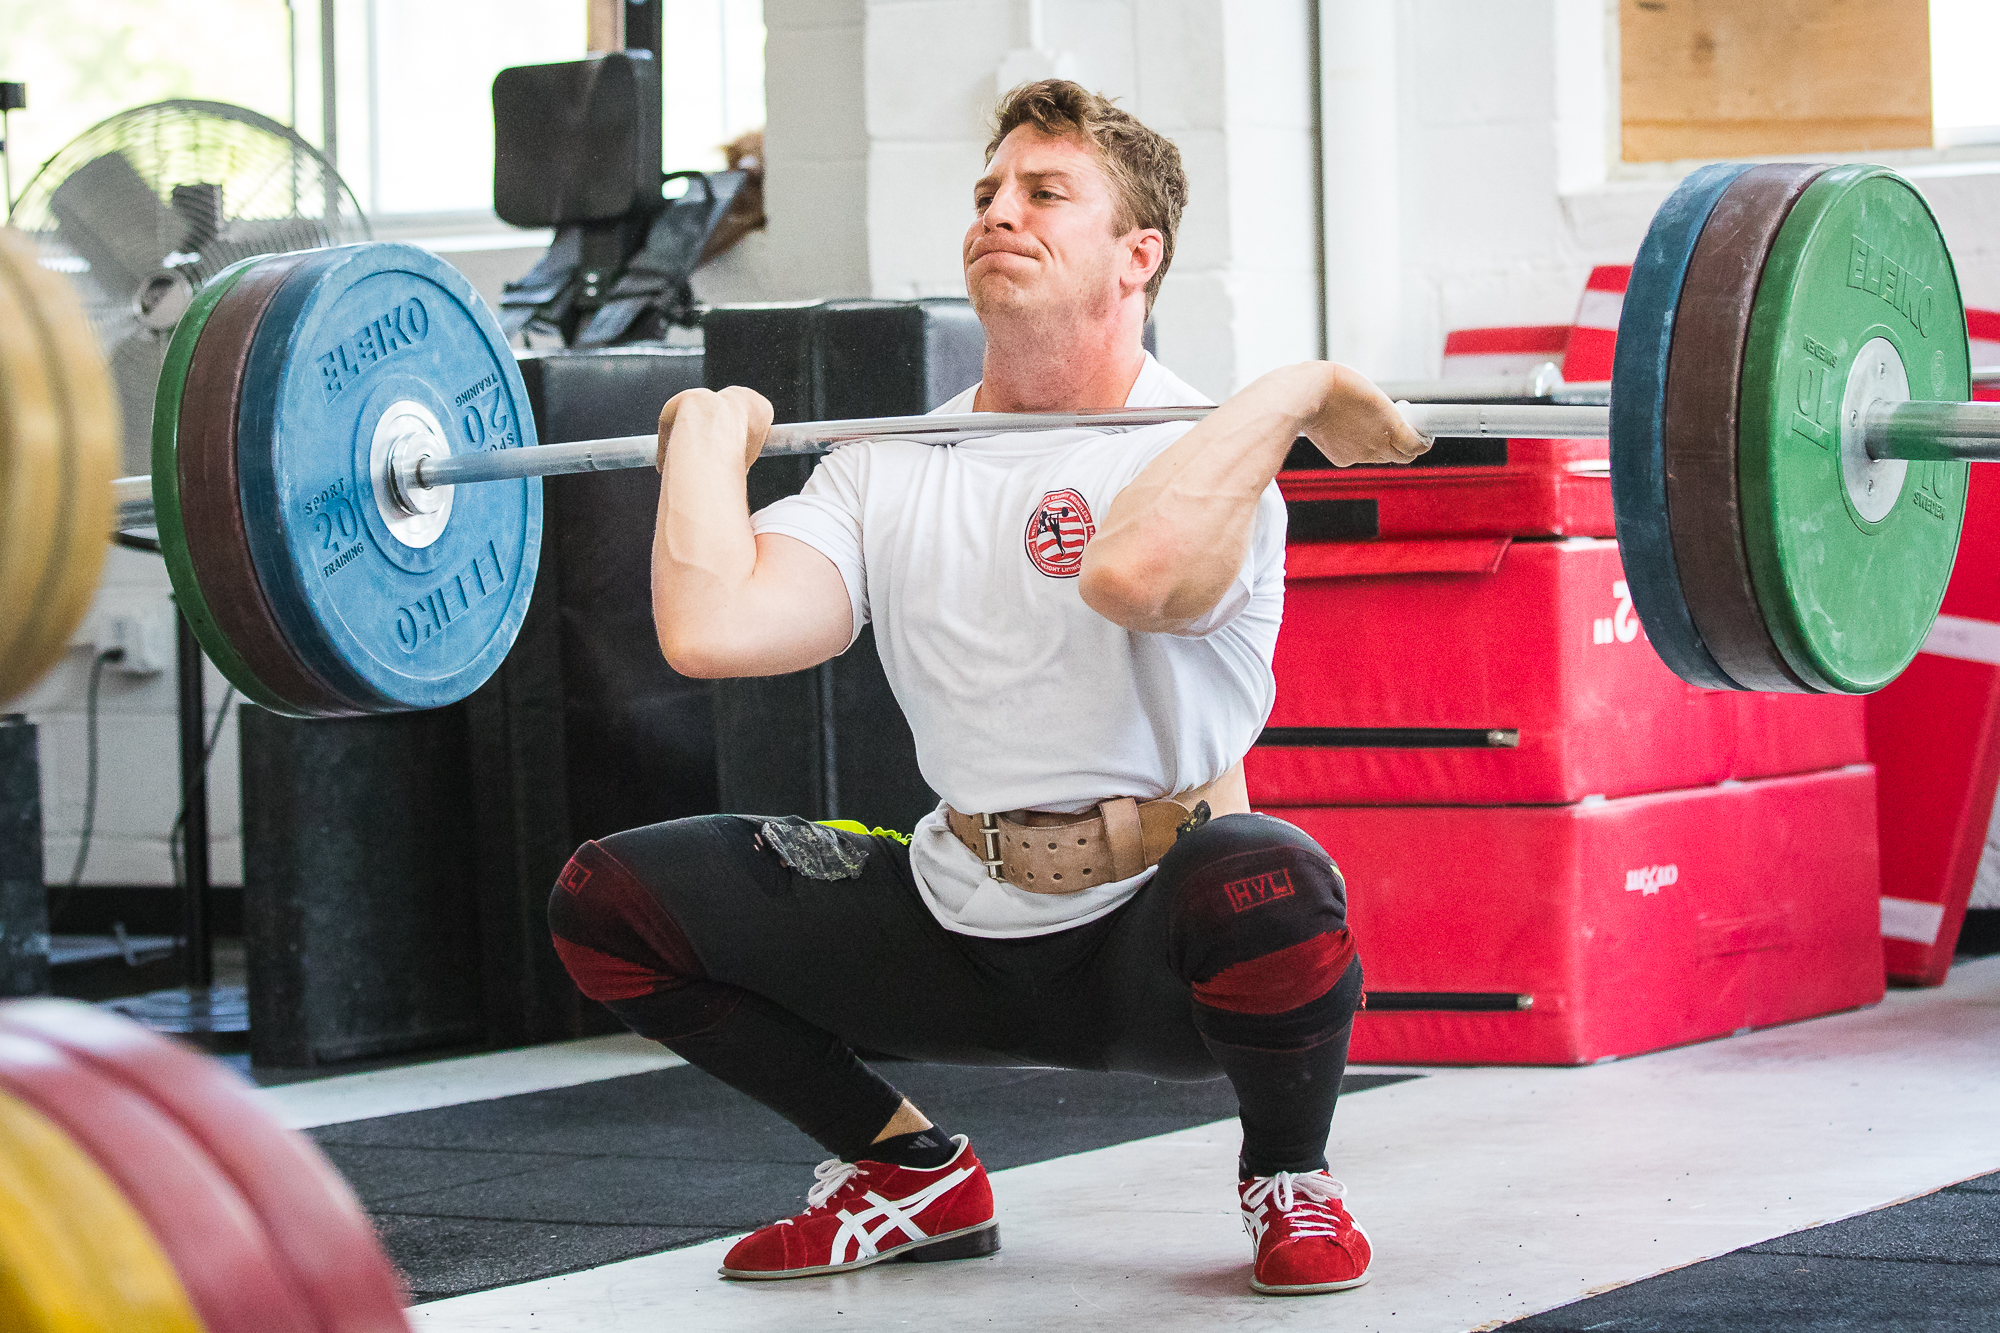 august-nywa-training-weightlifting-photos-by-everyday-lifters-viviana-podhaiski-14.jpg